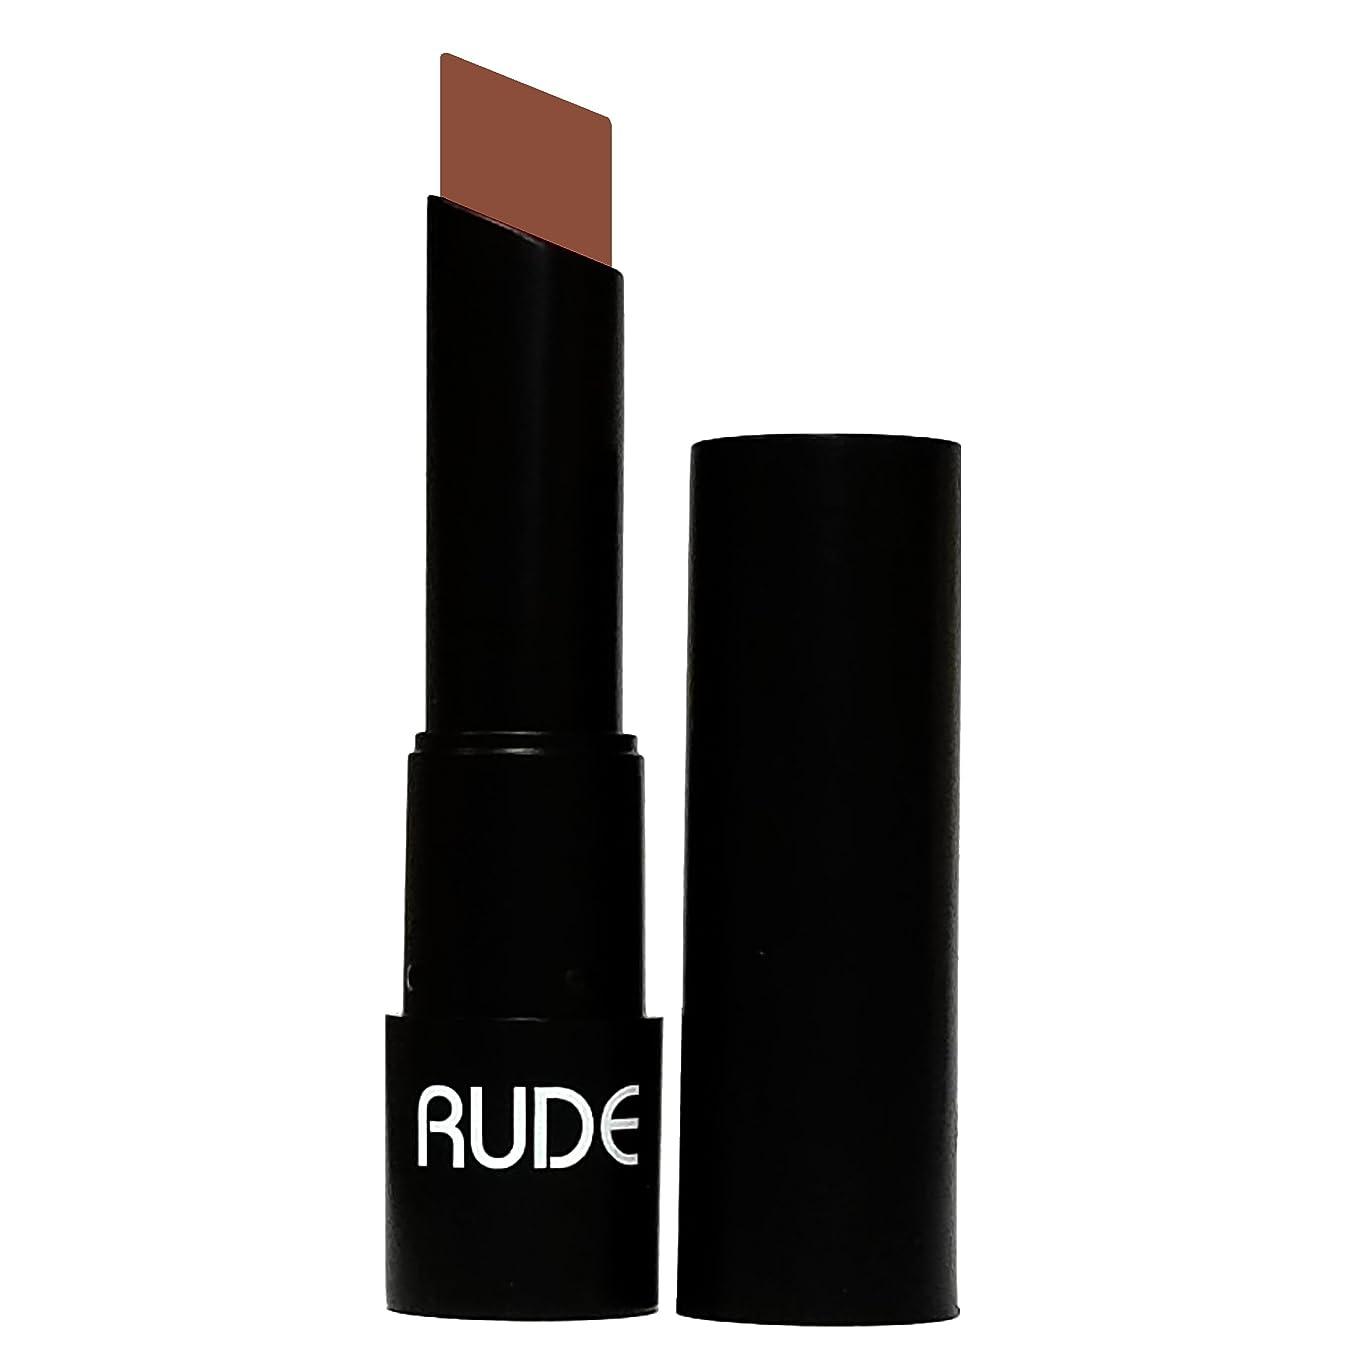 立方体日曜日宿命(6 Pack) RUDE Attitude Matte Lipstick - Reckless (並行輸入品)